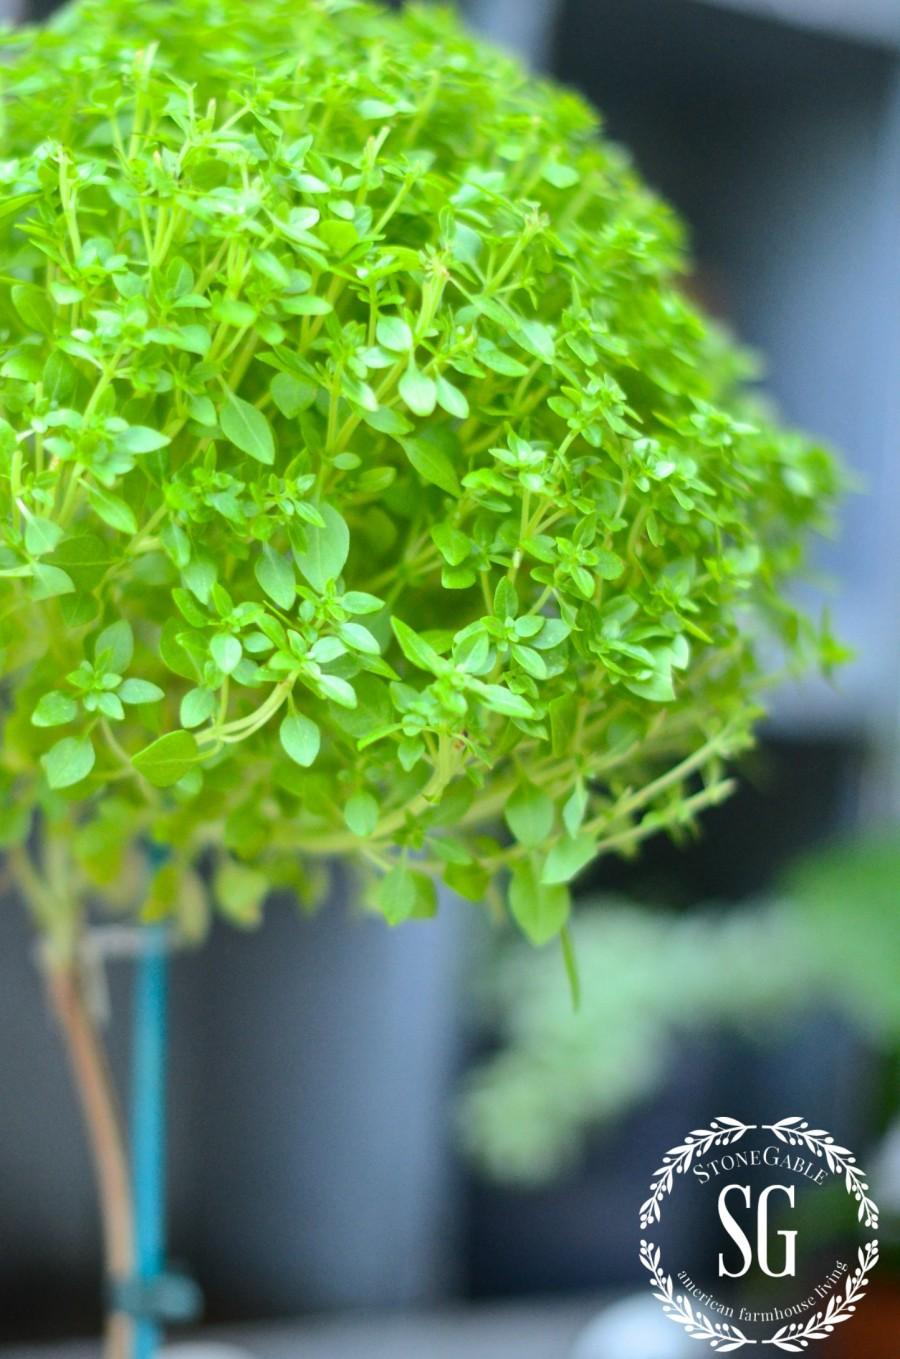 SUMMER POTTING BENCH-tiny basil leaves-stonegableblog.com